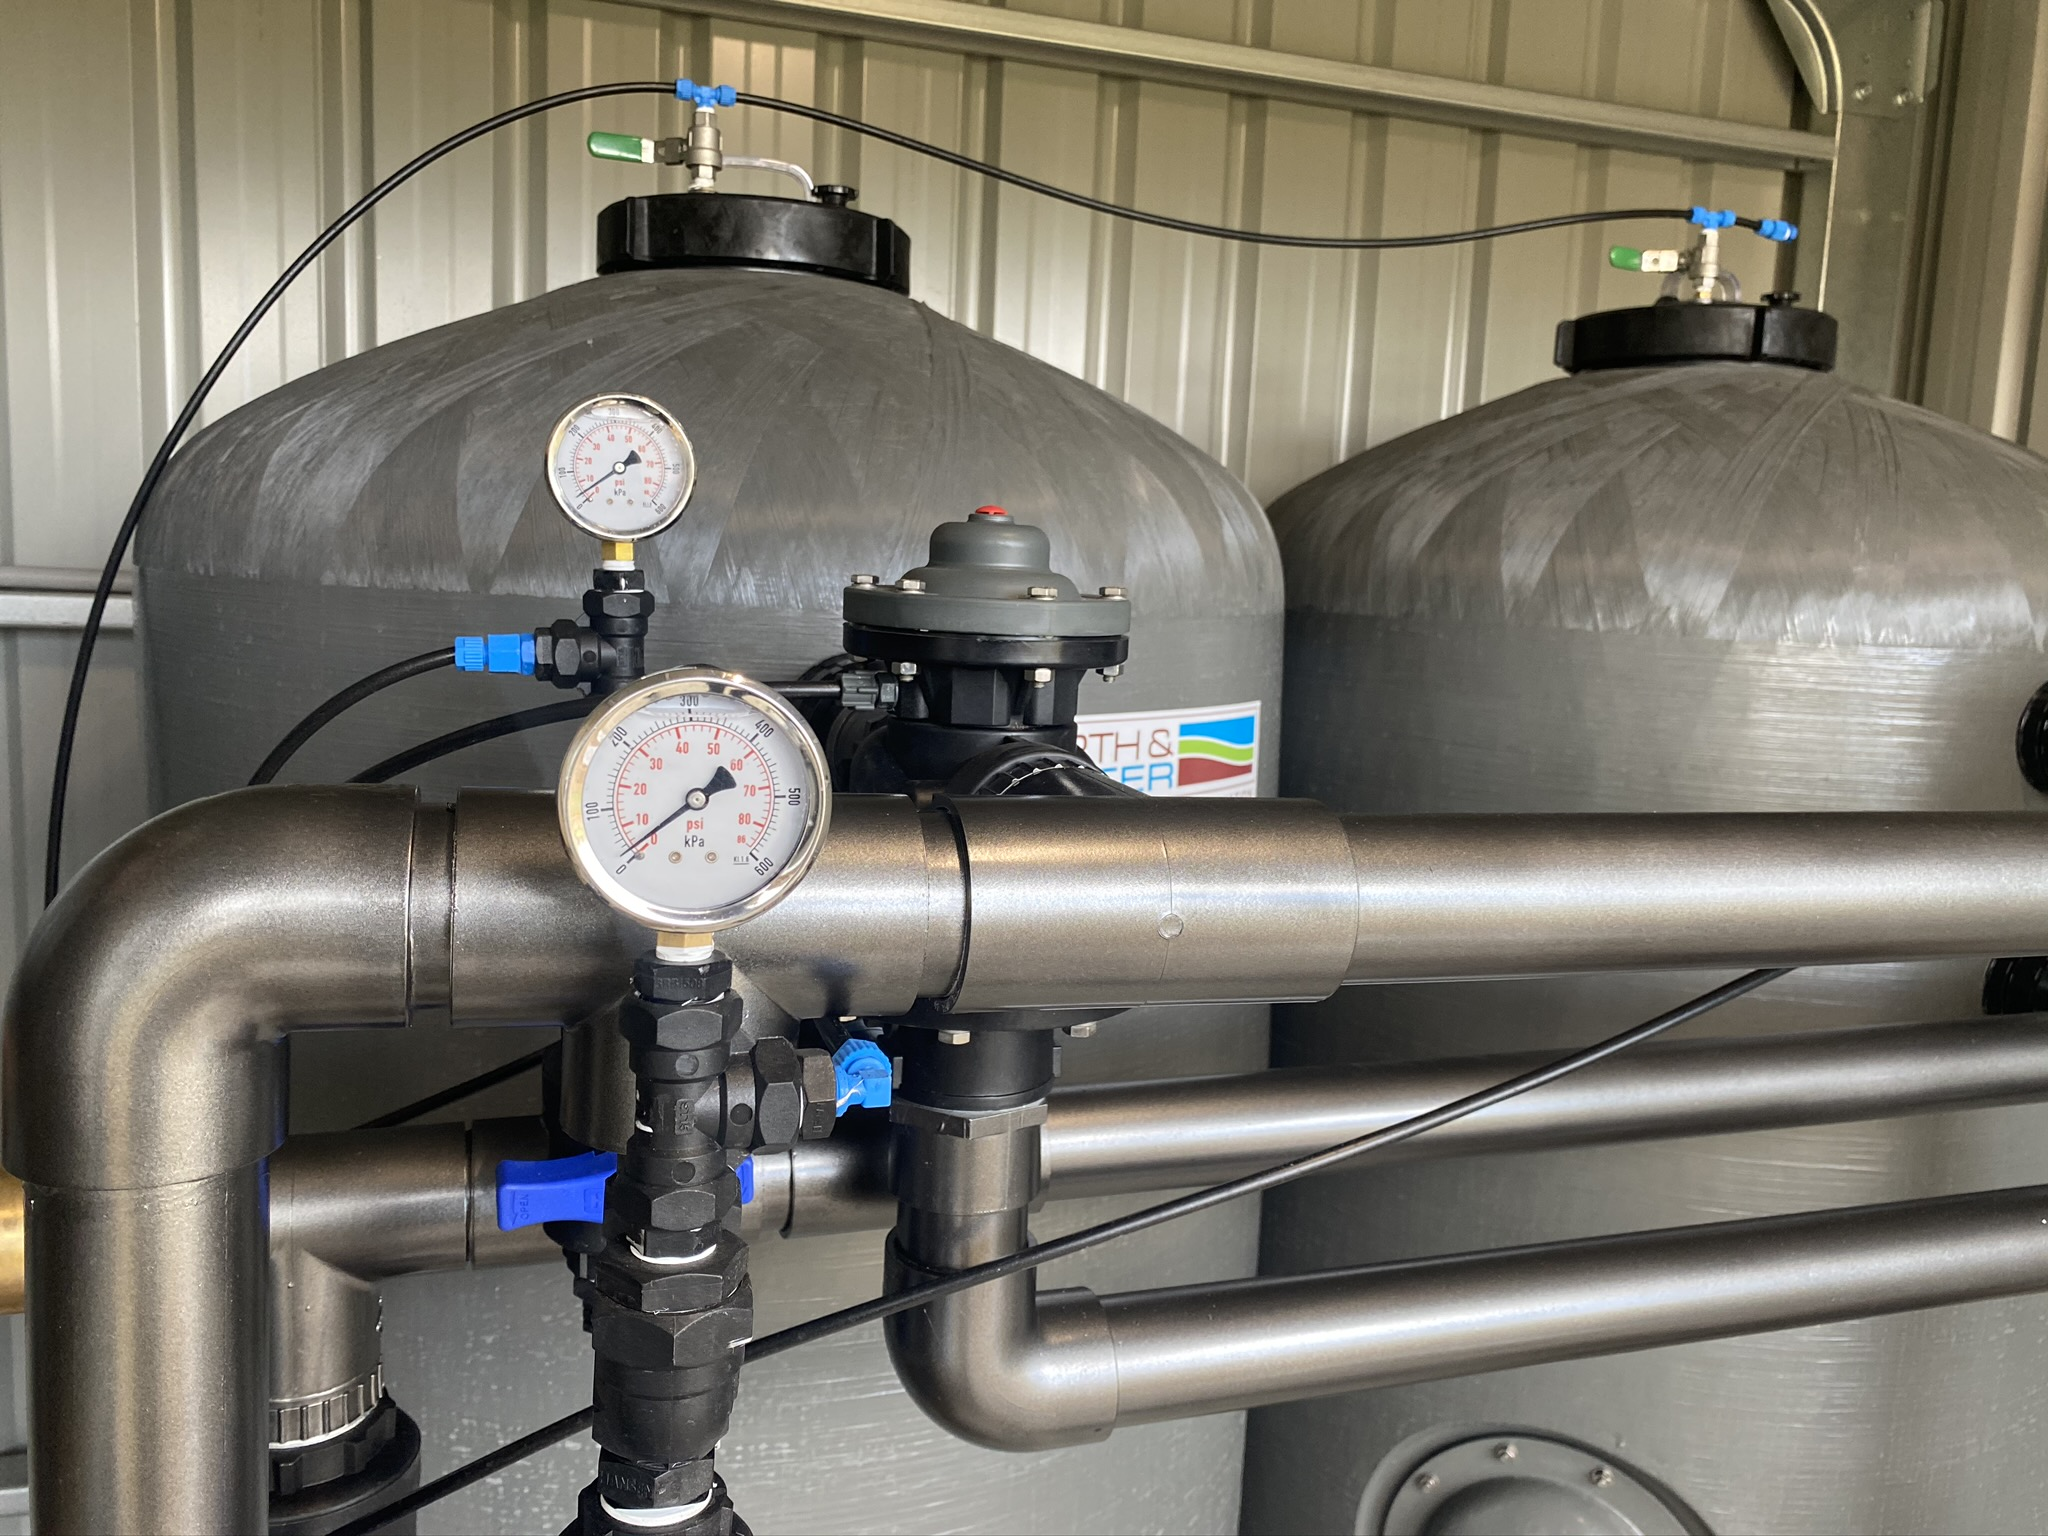 Joondalup Bore water treatment